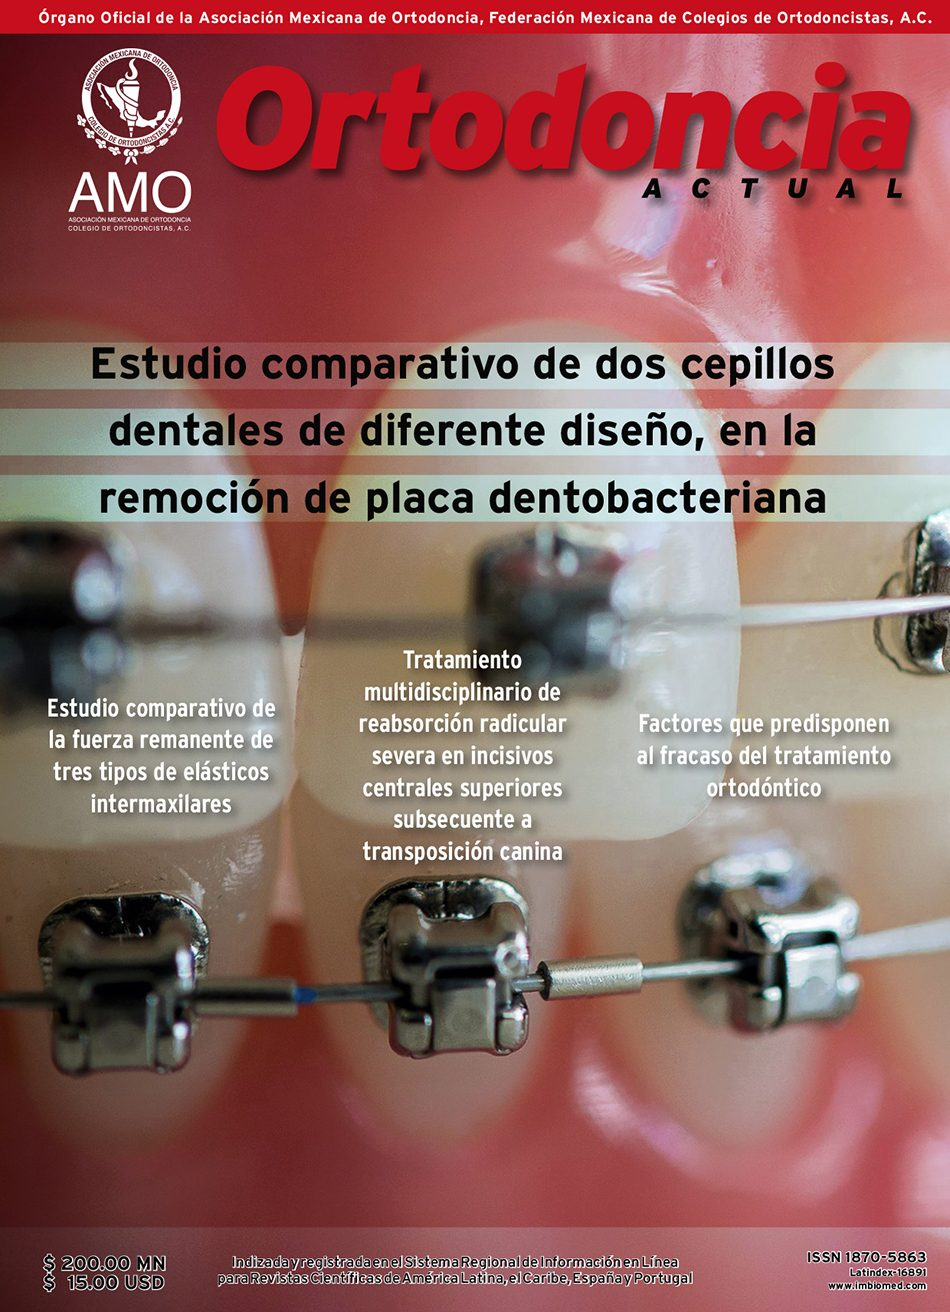 Ortodoncia Actual 61